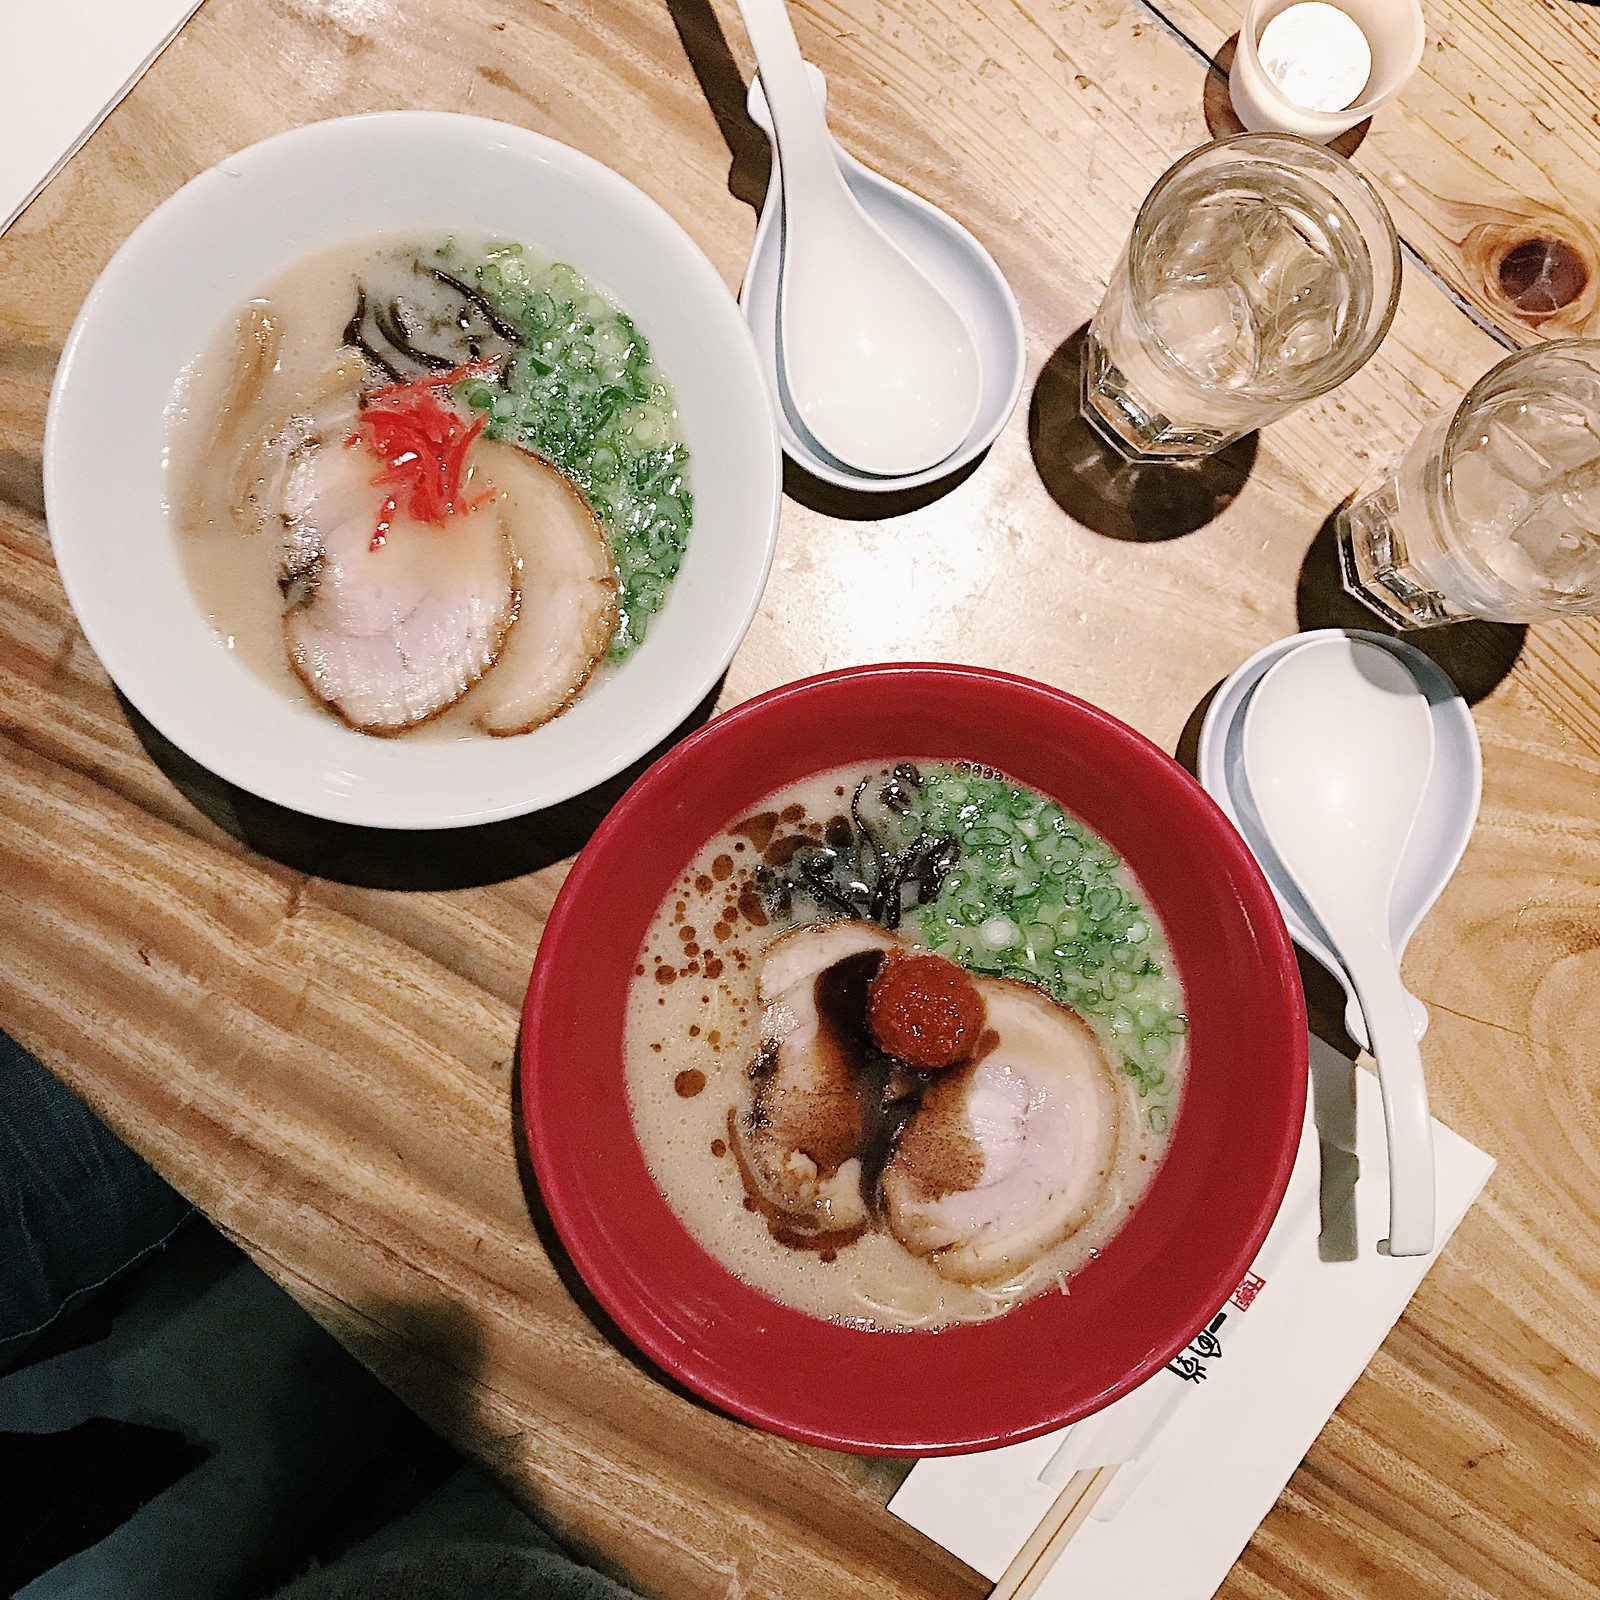 ippudo-japanese-ramen-foodie-hipster-foodporn-nyc-newyorkcity-newyork-clothestoyouuu-elizabeeetht